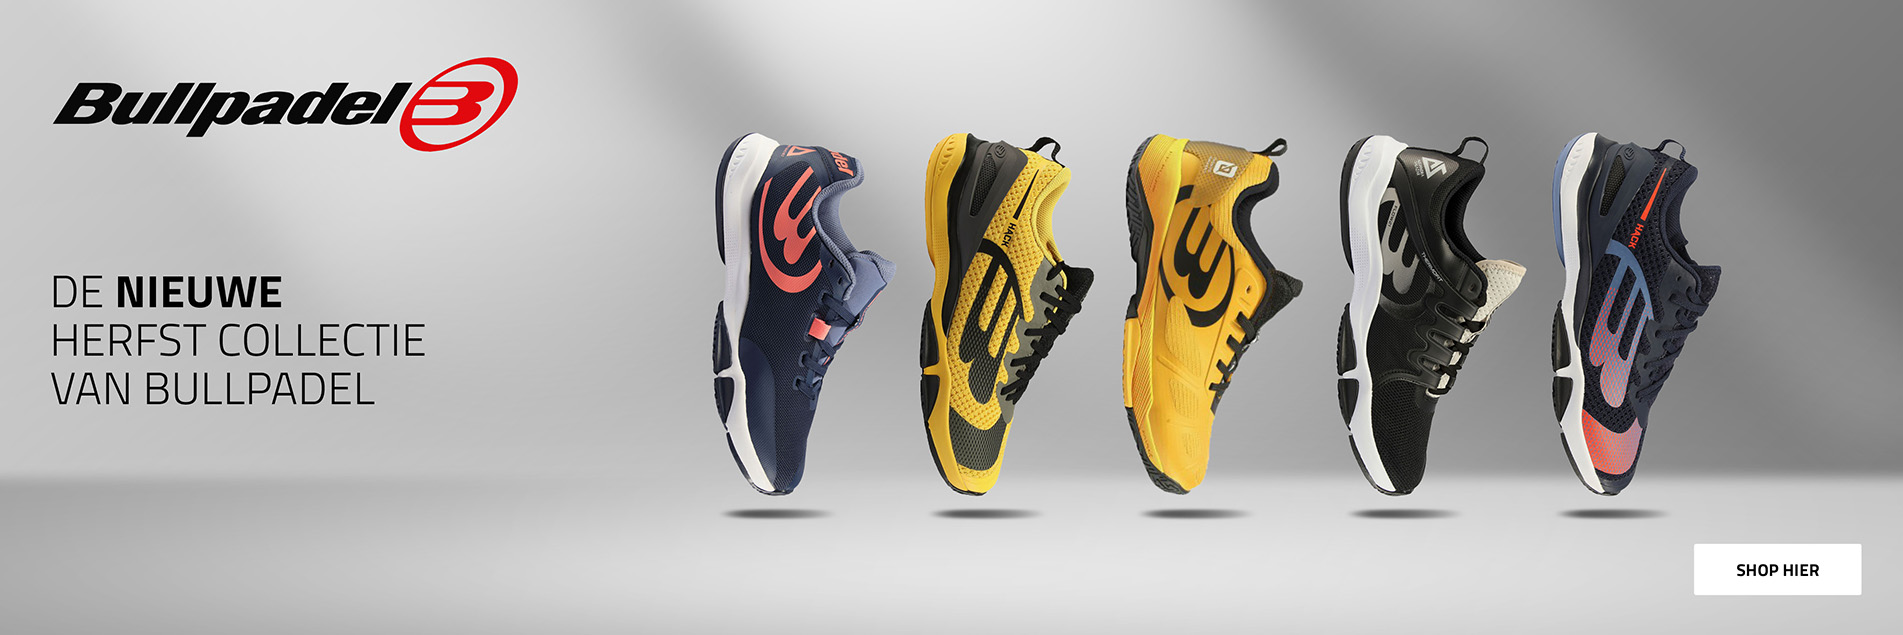 Bullpadel schoenen